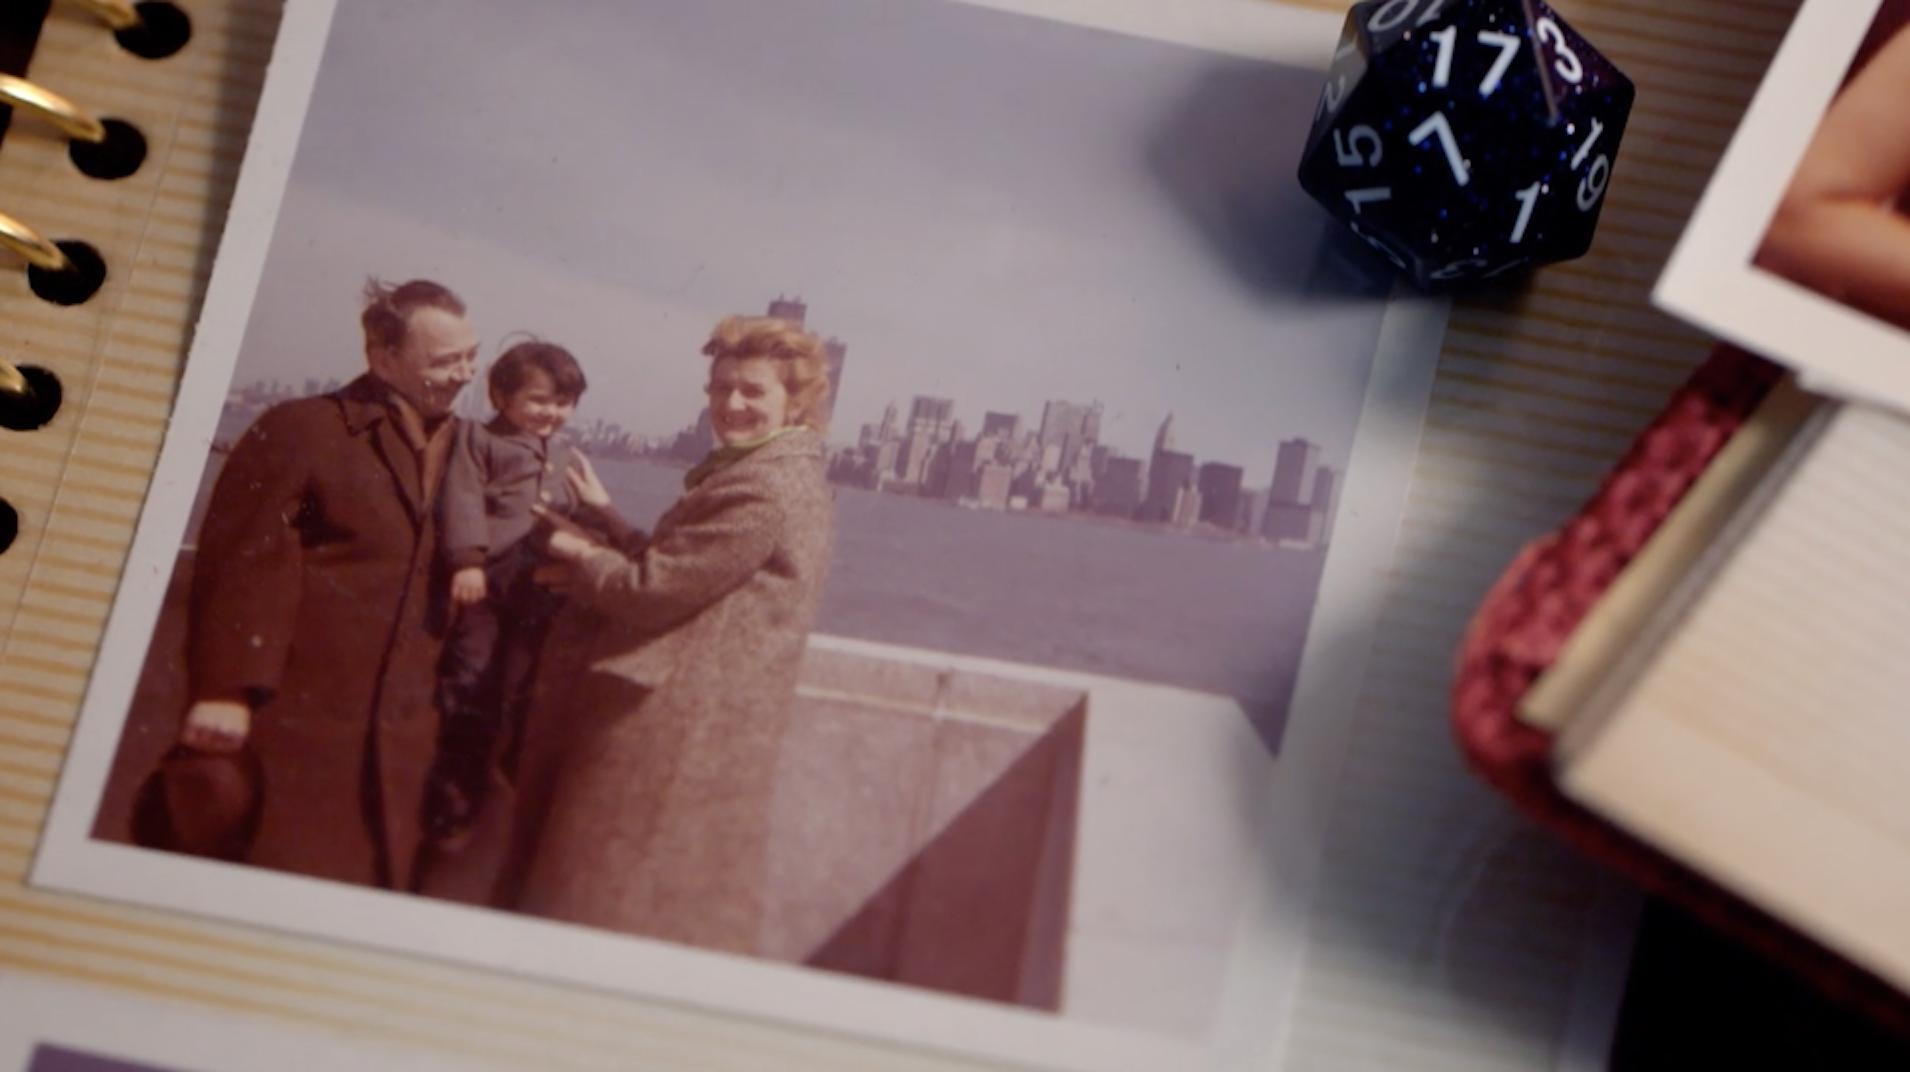 Pokorny with his adoptive family in New York City.